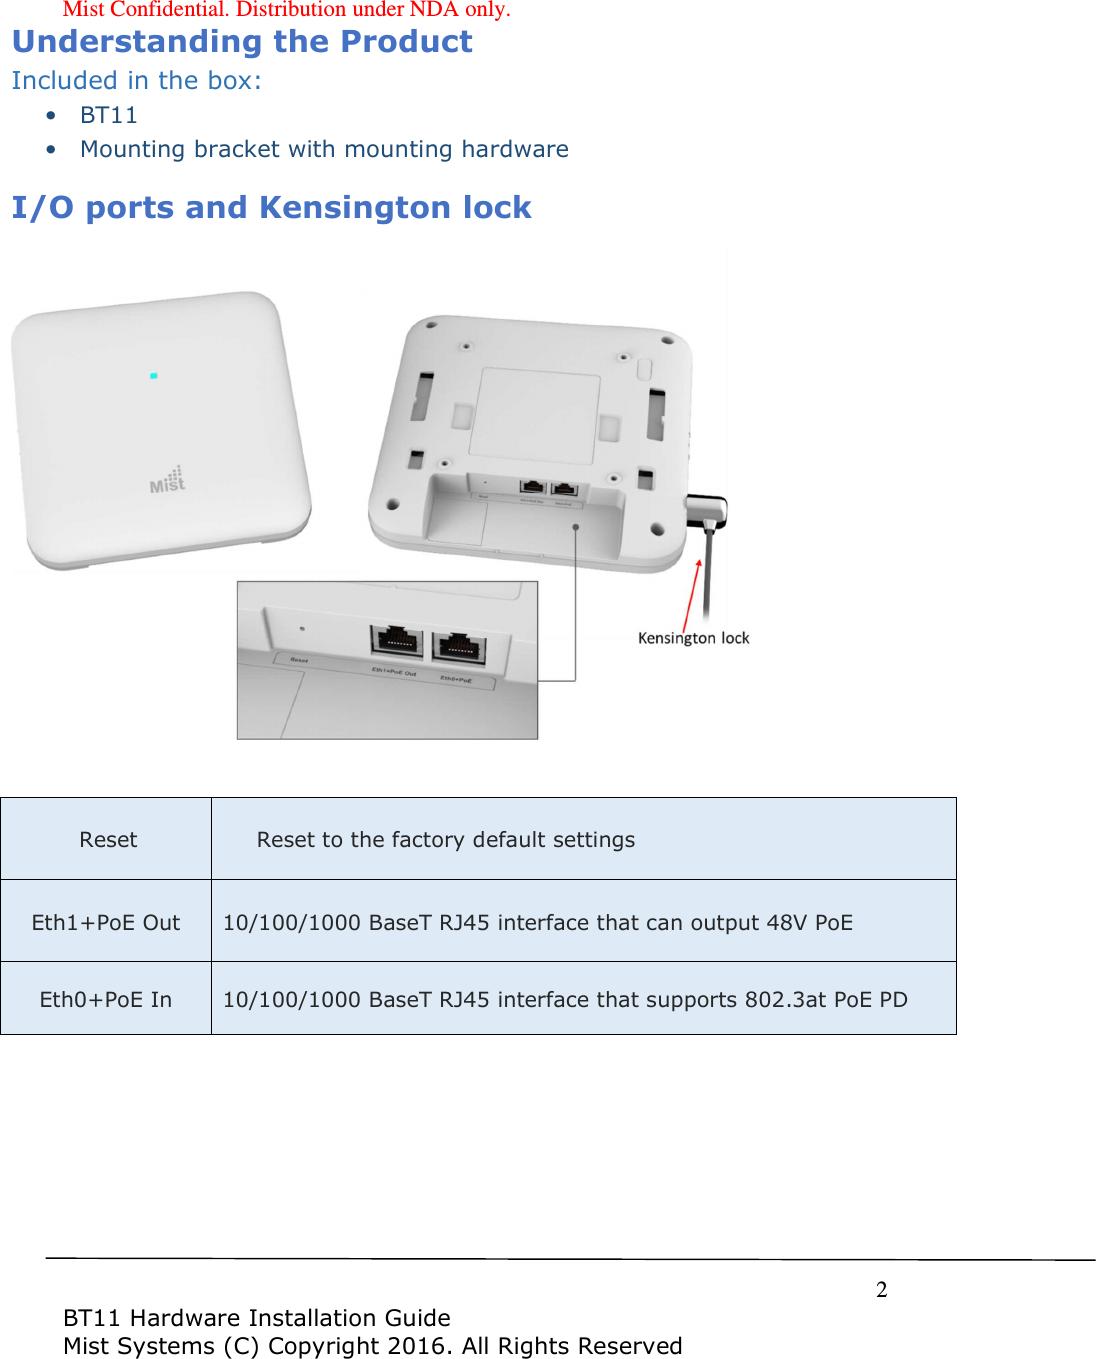 Mist Systems BT11 BLE Array AP - internal Antenna User Manual